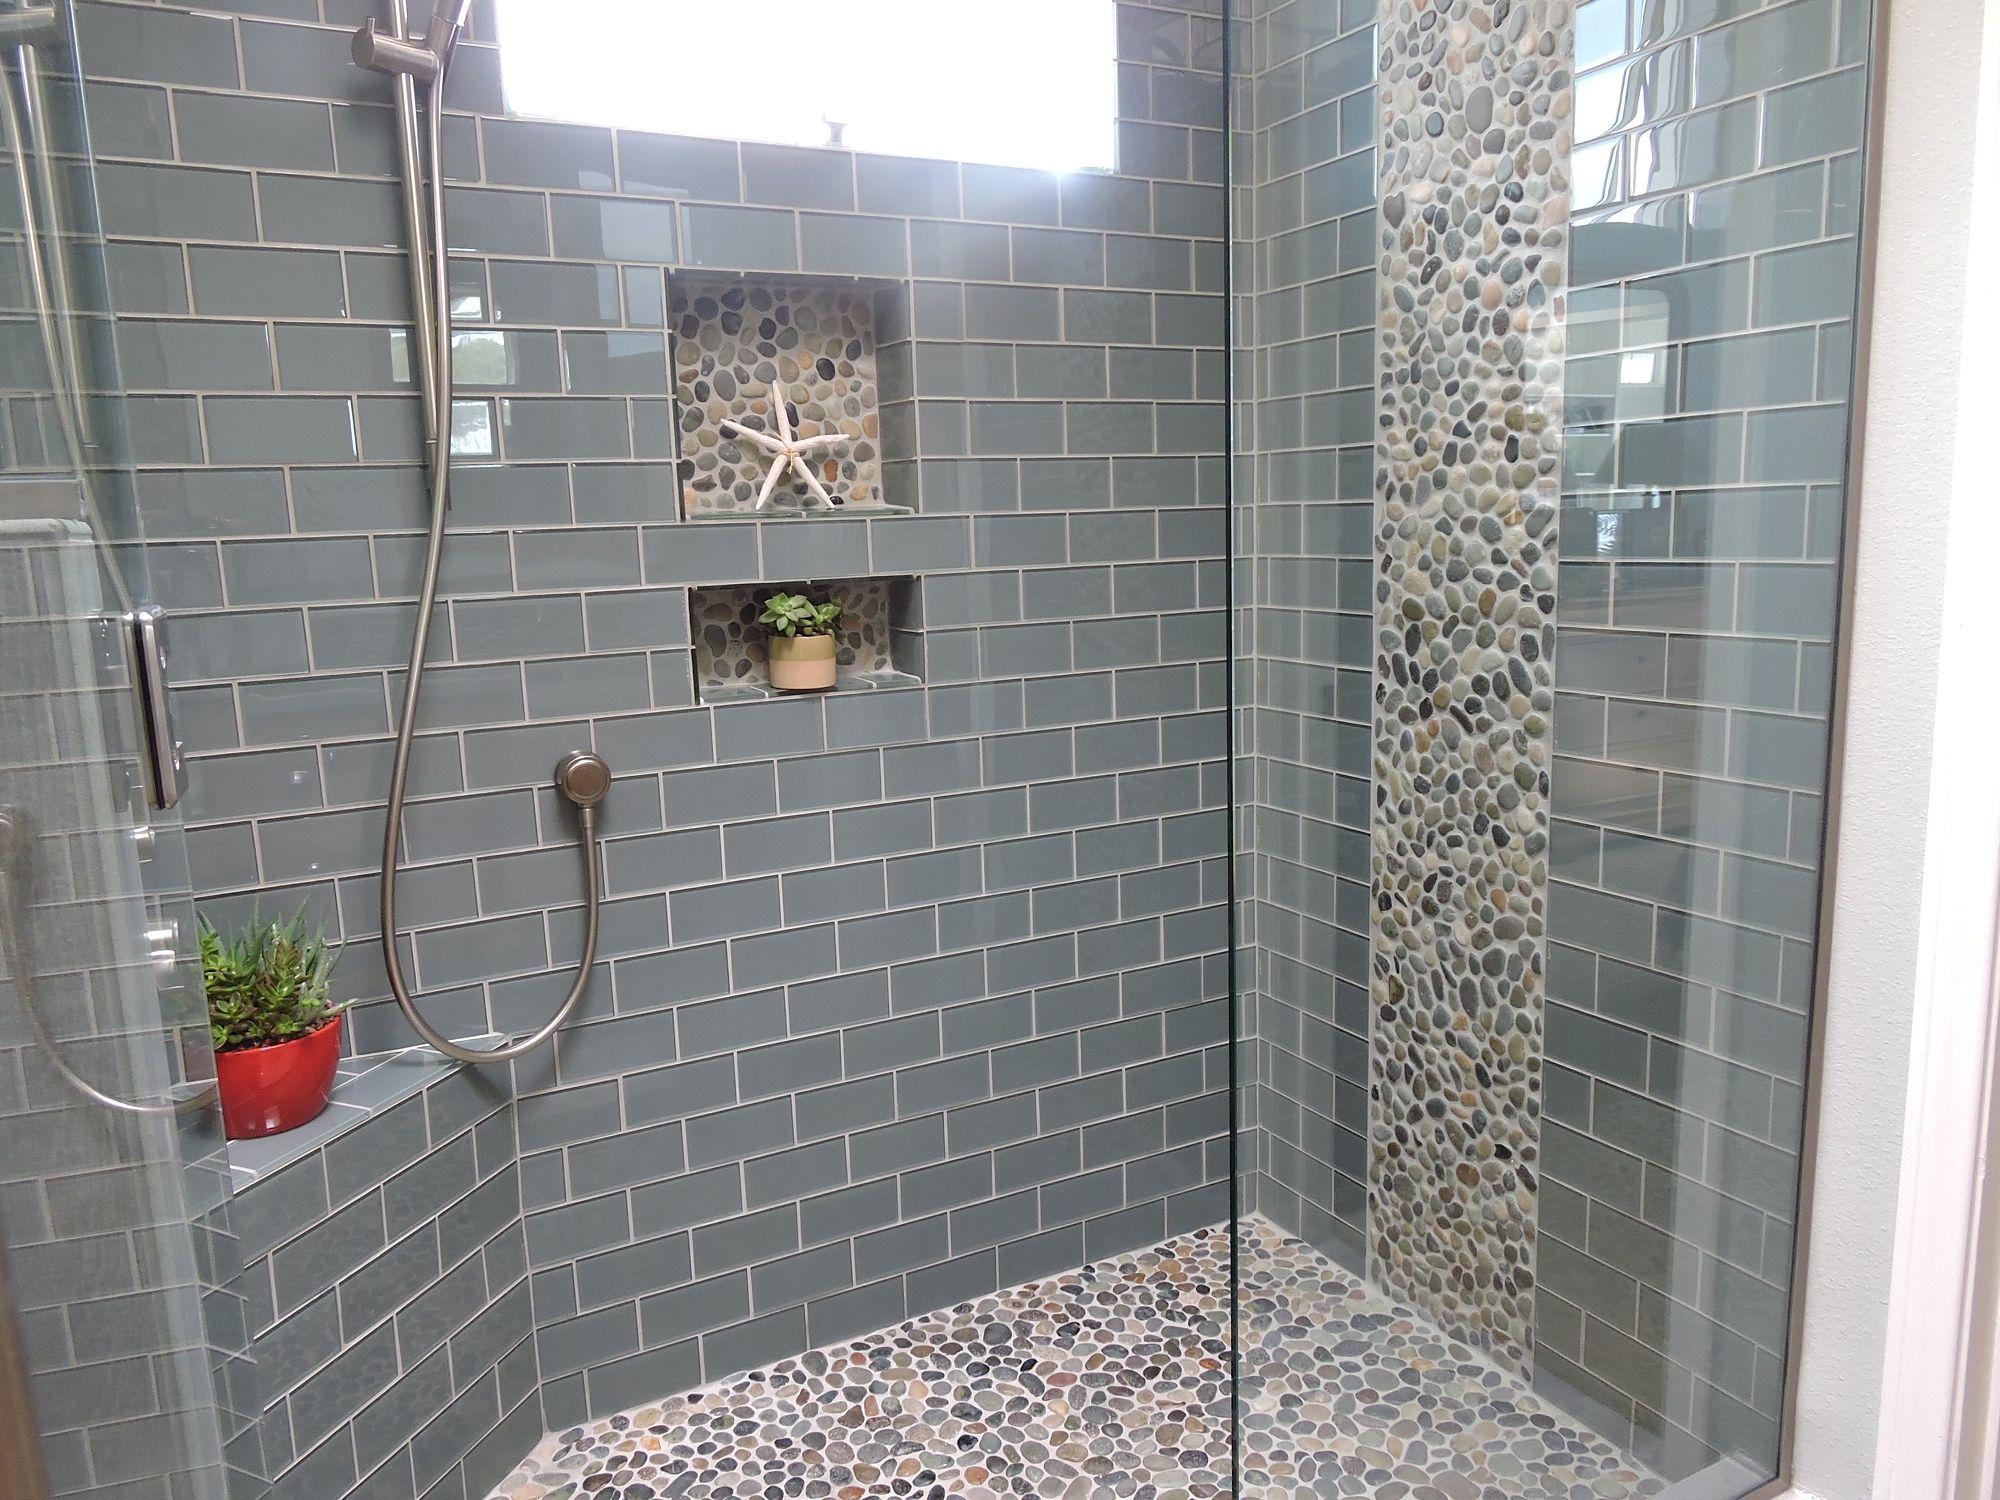 Ocean Glass Subway Tile Pebble Floor Examples And Shower Tiles - Subway tiles in bathroom